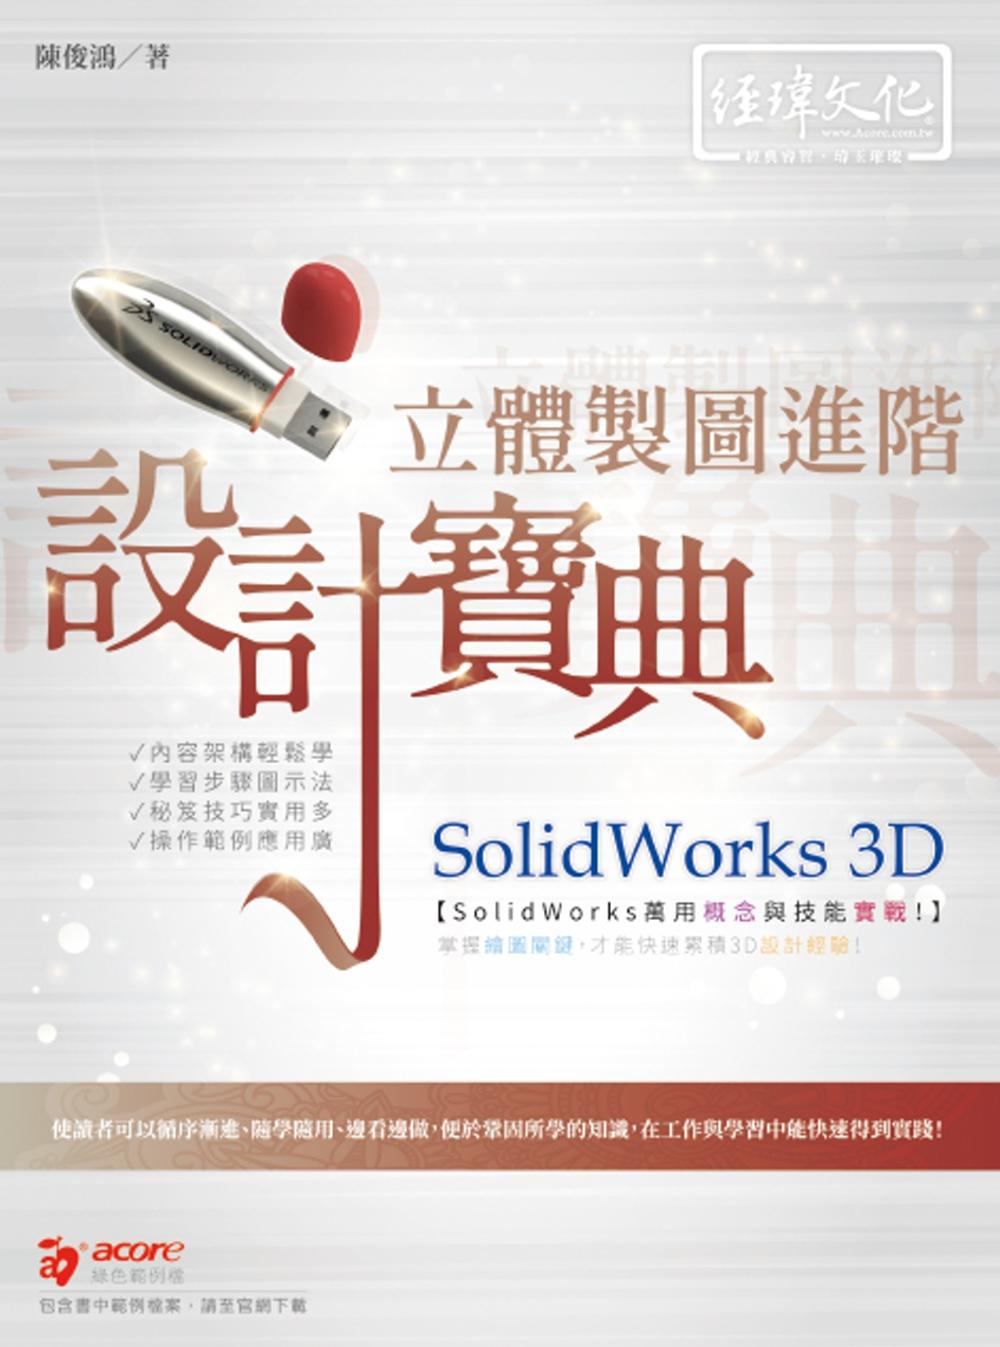 SolidWorks 3D 立體製圖進階設計寶典